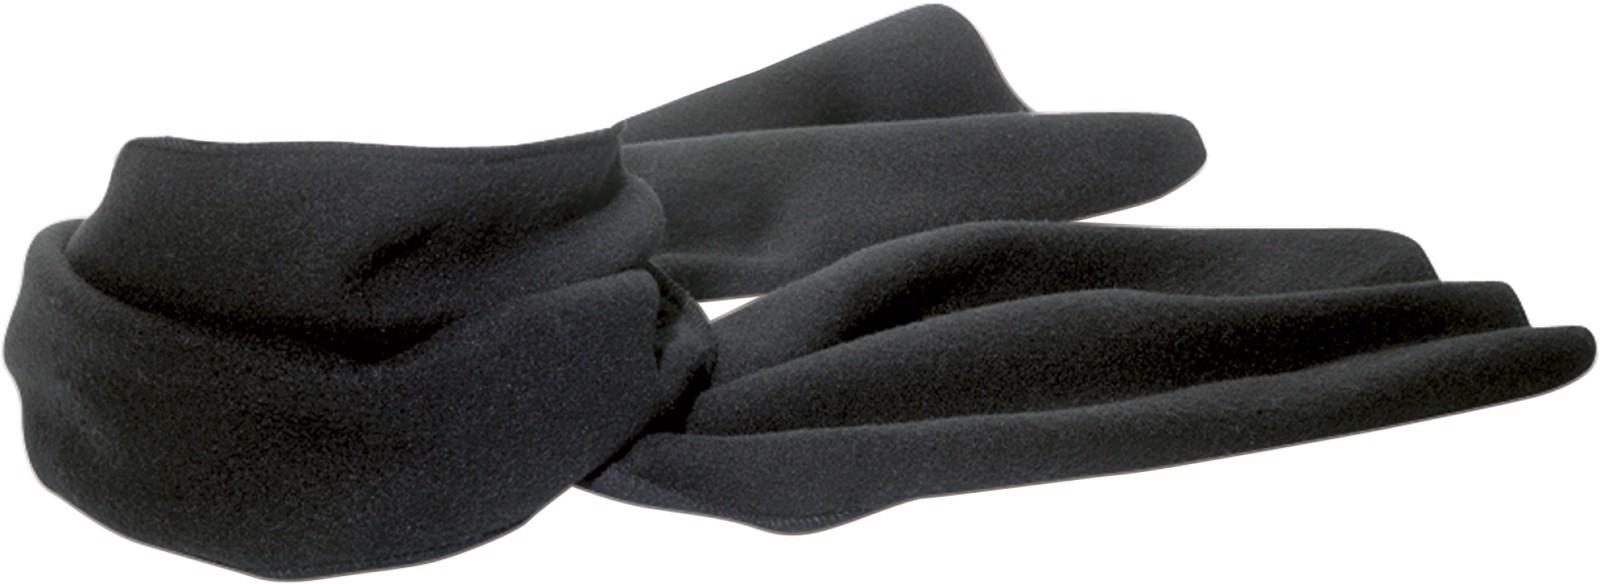 Polyester fleece (200 gr/m²) scarf - Black